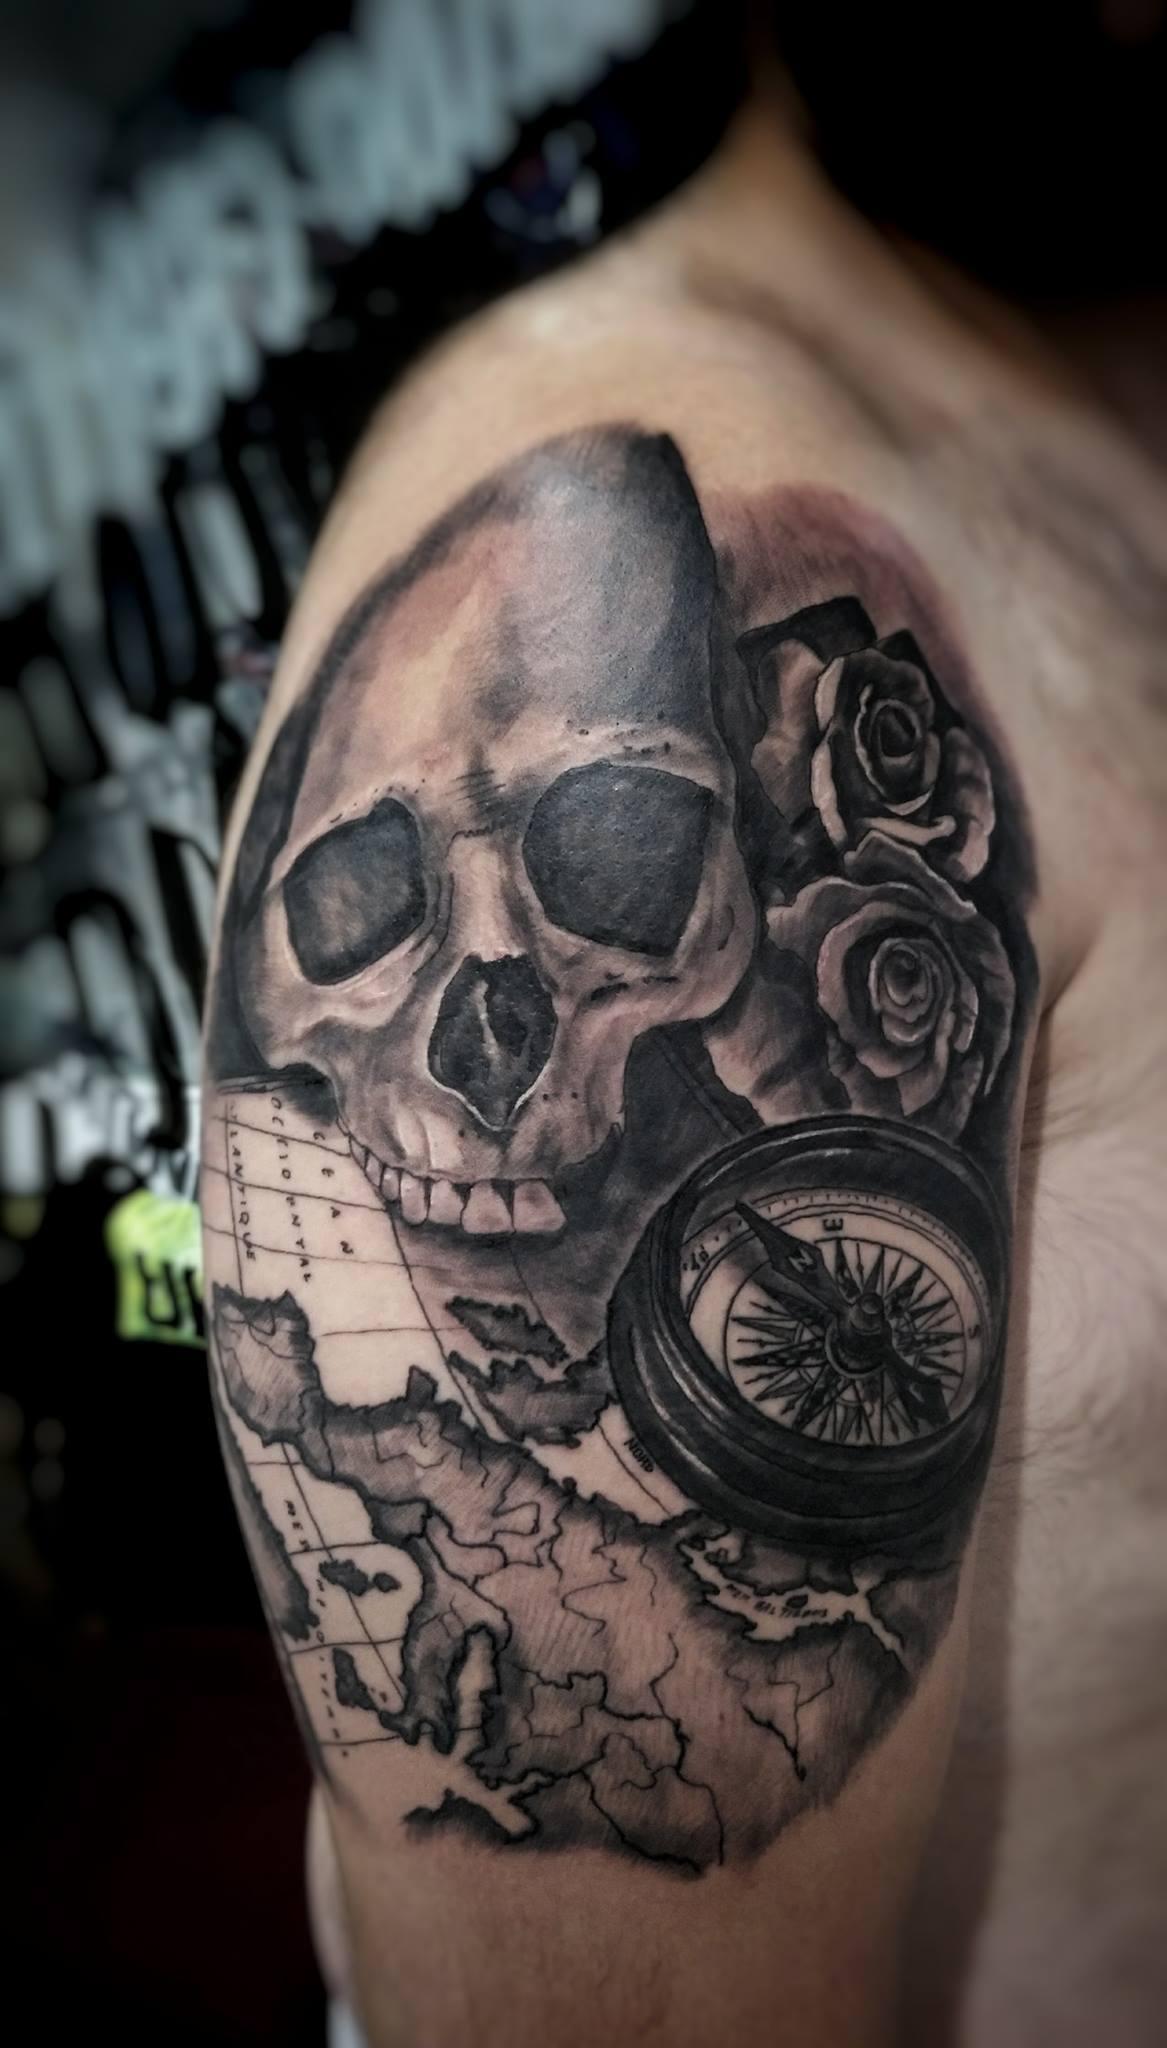 home tatuaje tattoo palencia realismo calavera